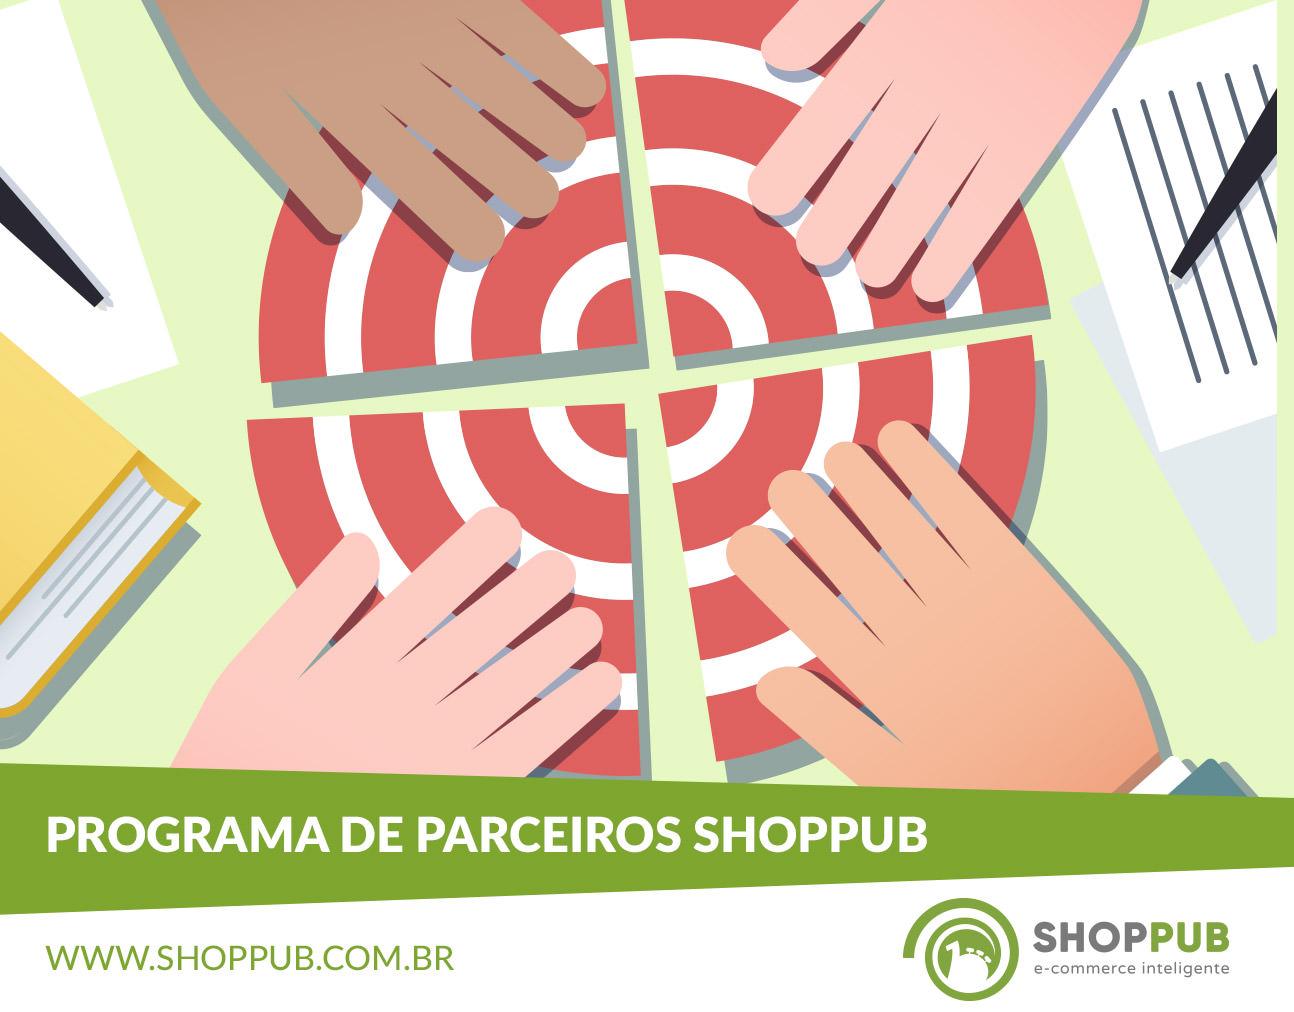 Programa de Parceiros Shoppub